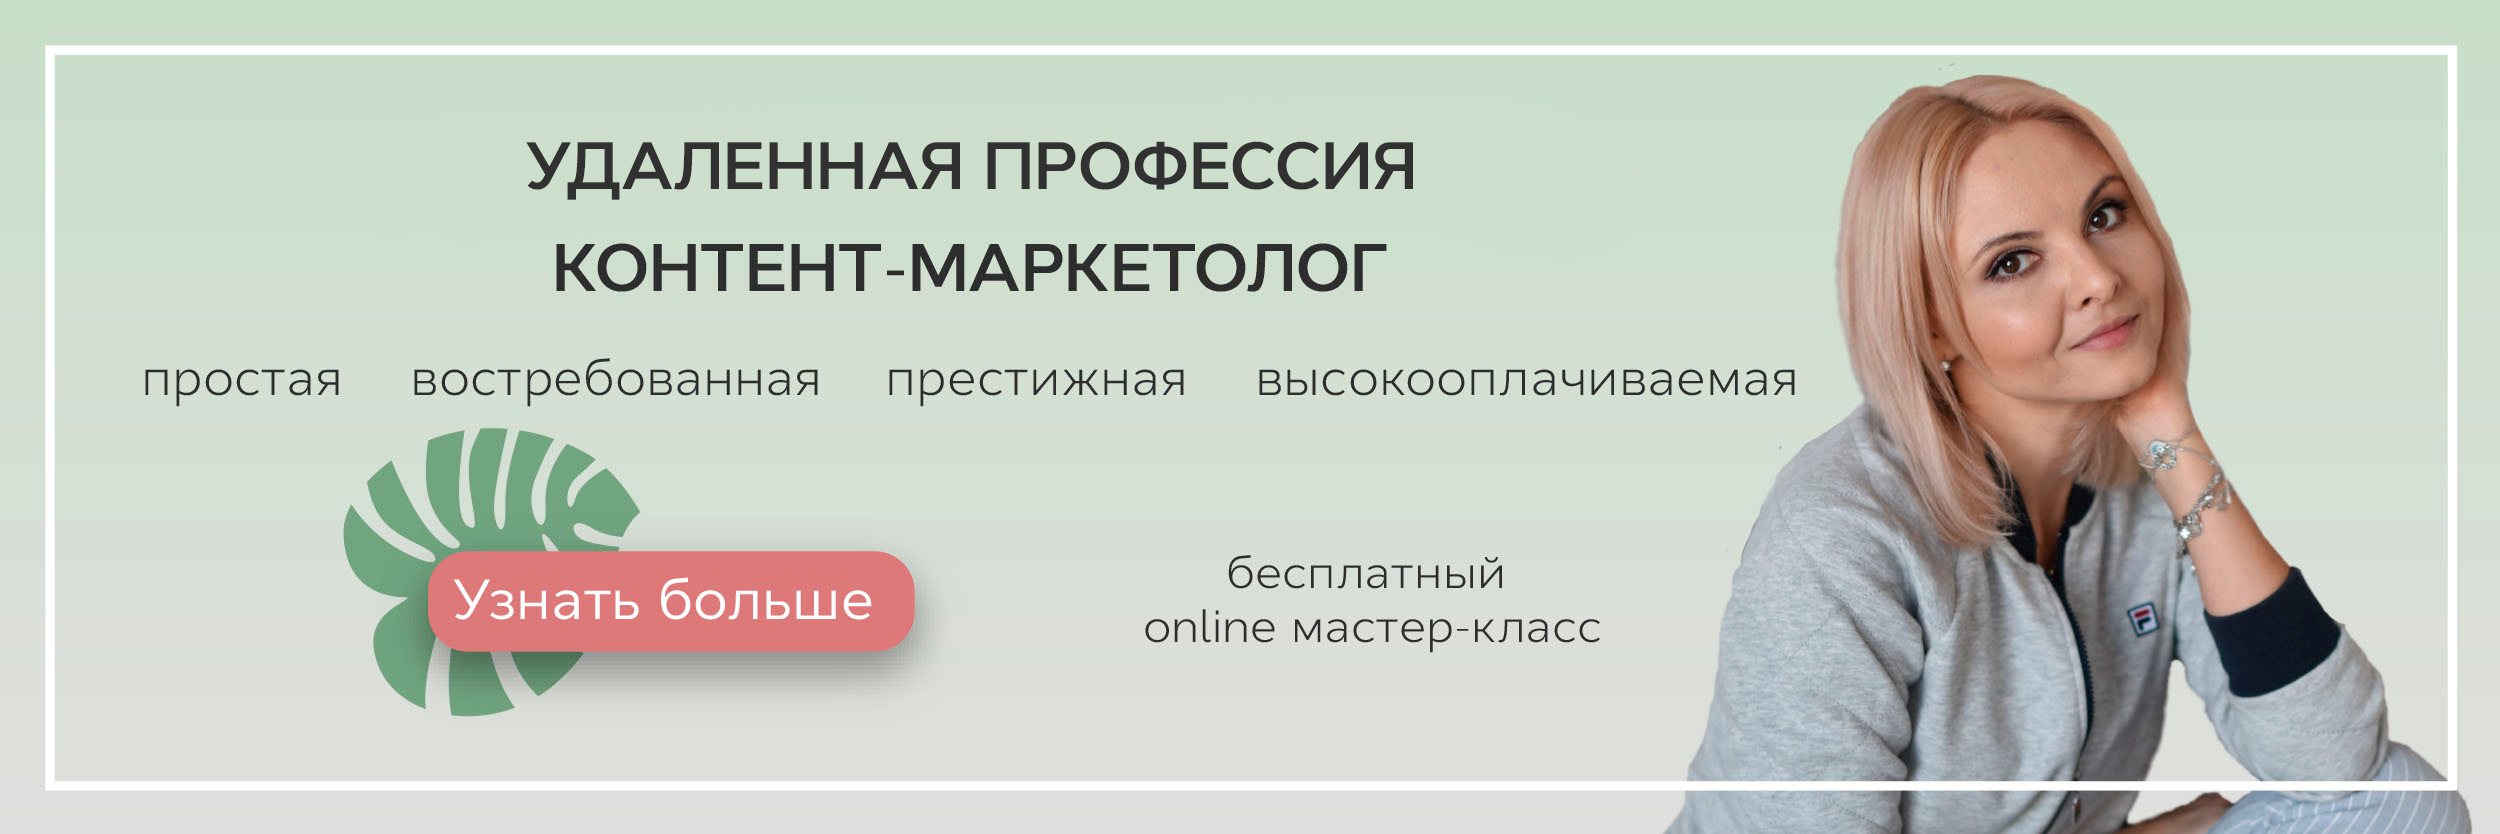 Удалённая профессия контент маркетолога